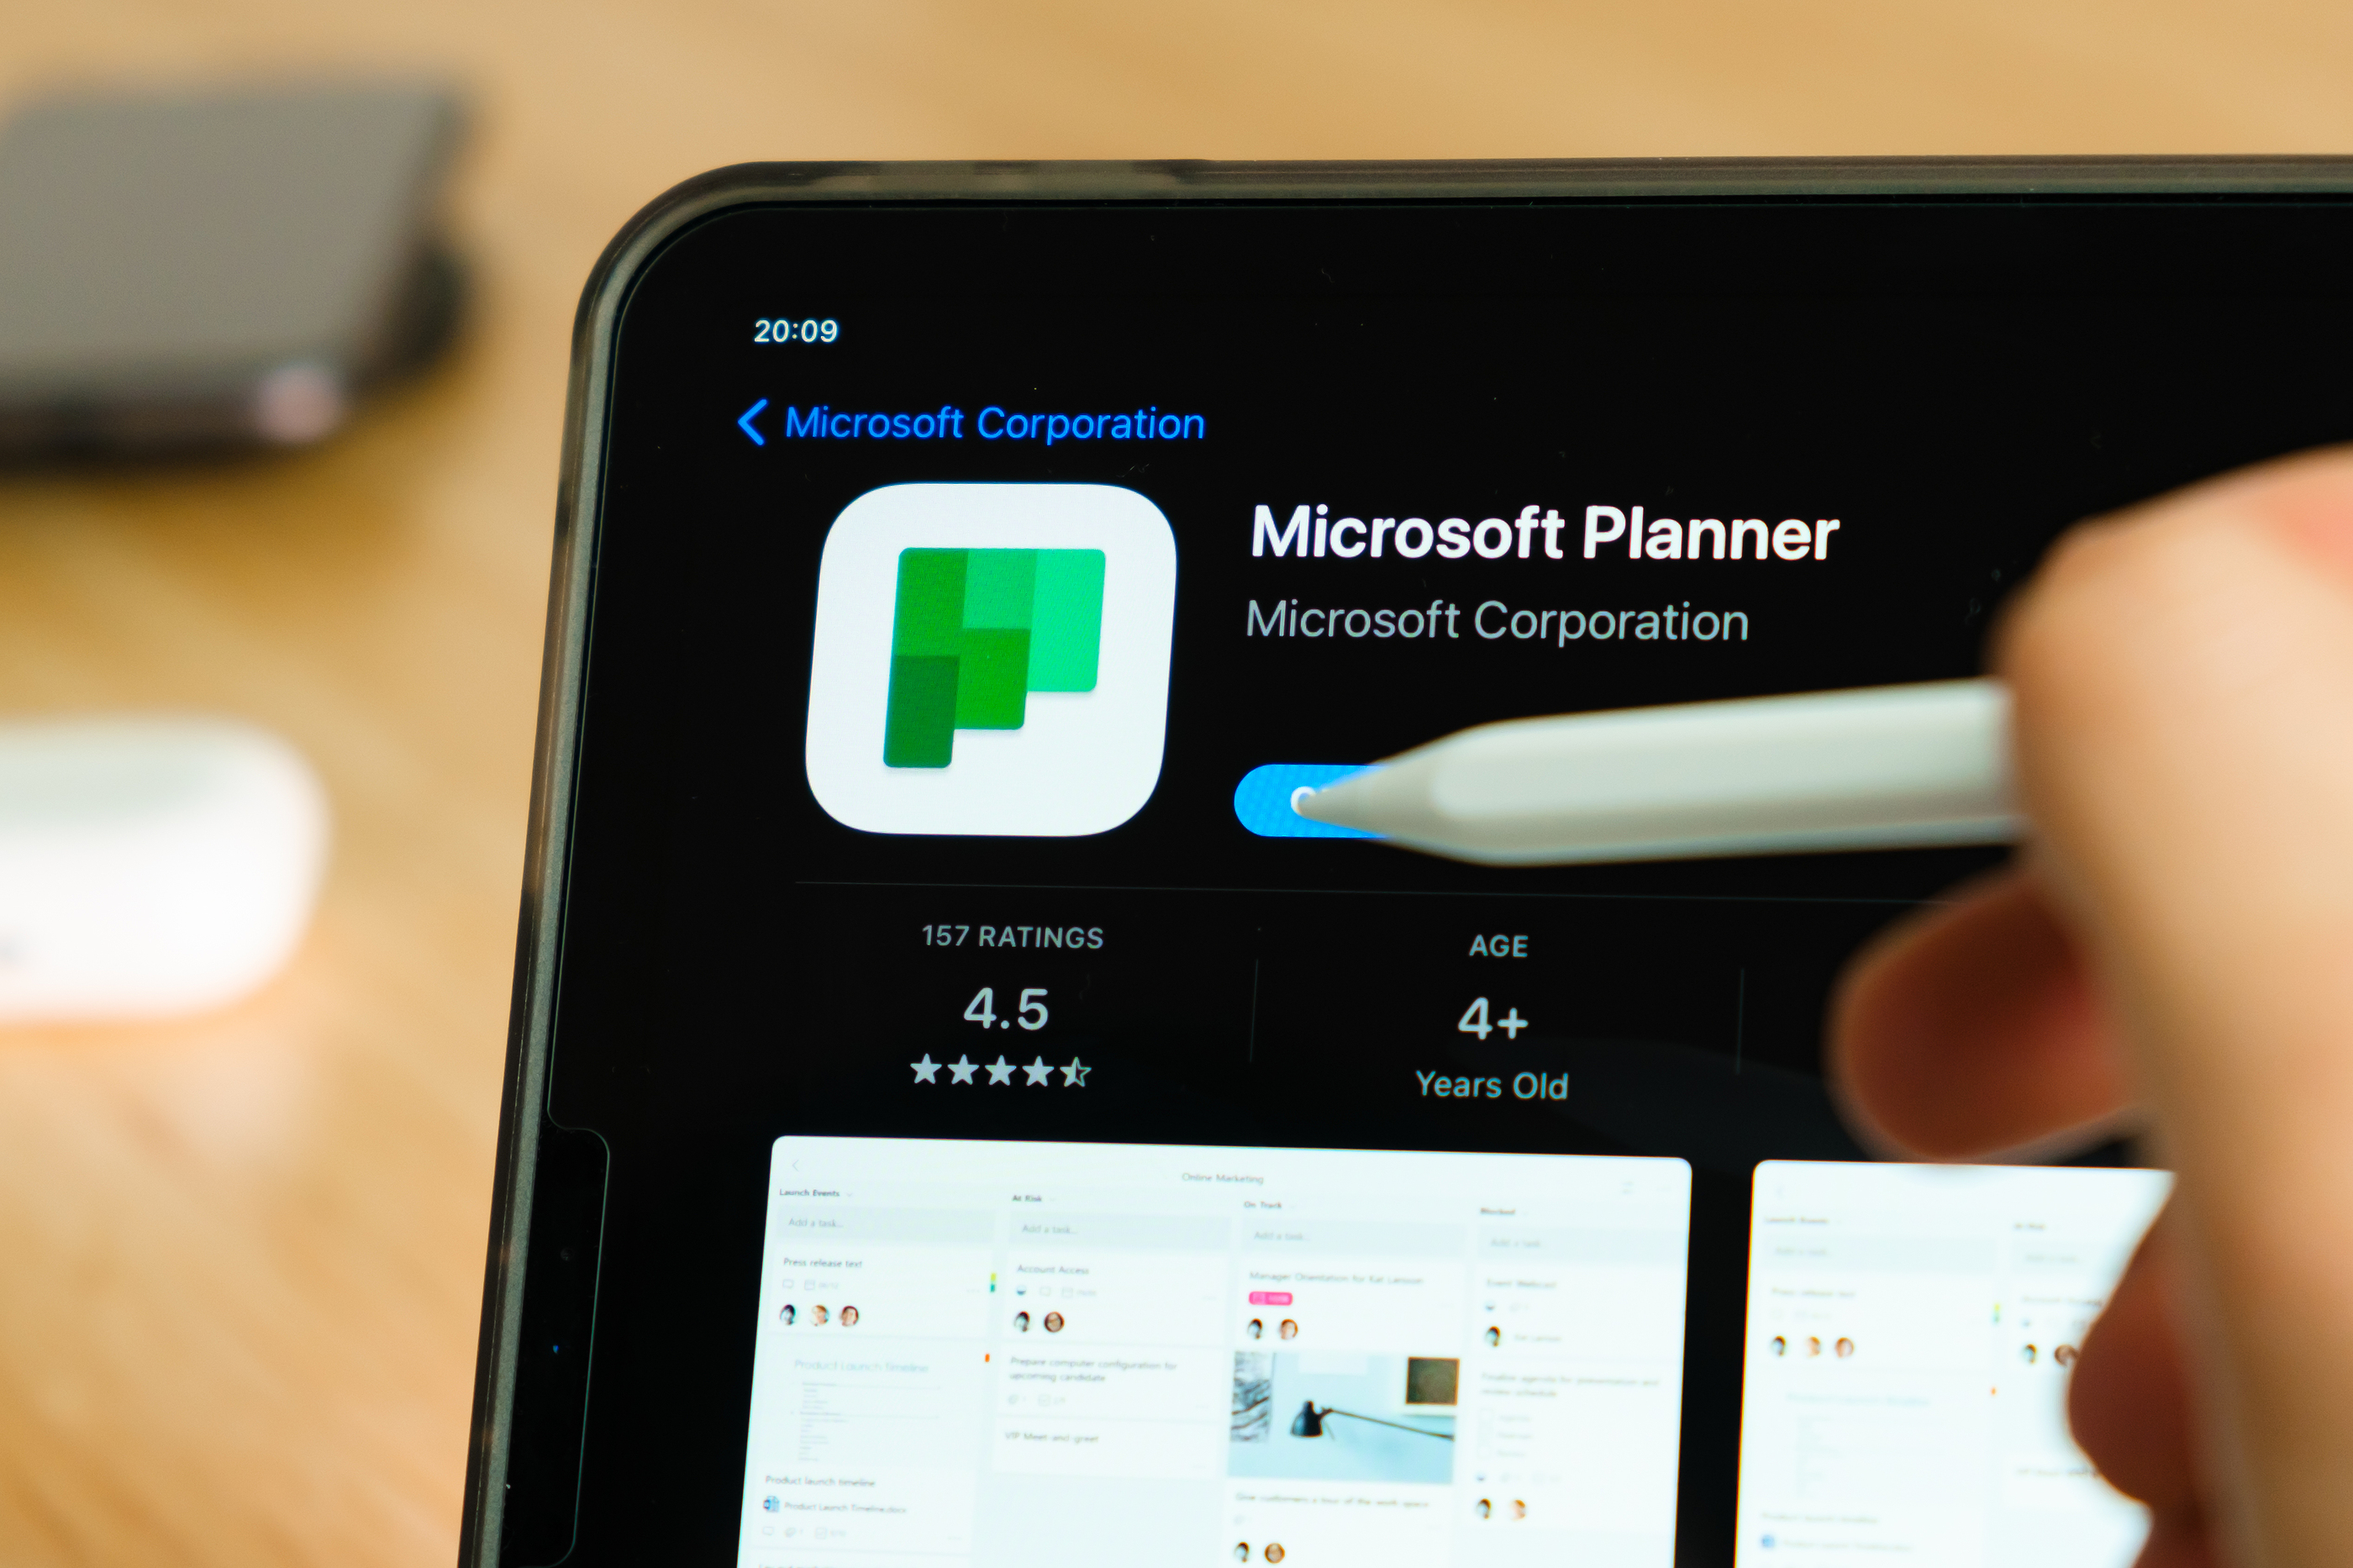 bigstock Microsoft Planner Logo Shown B 401558492